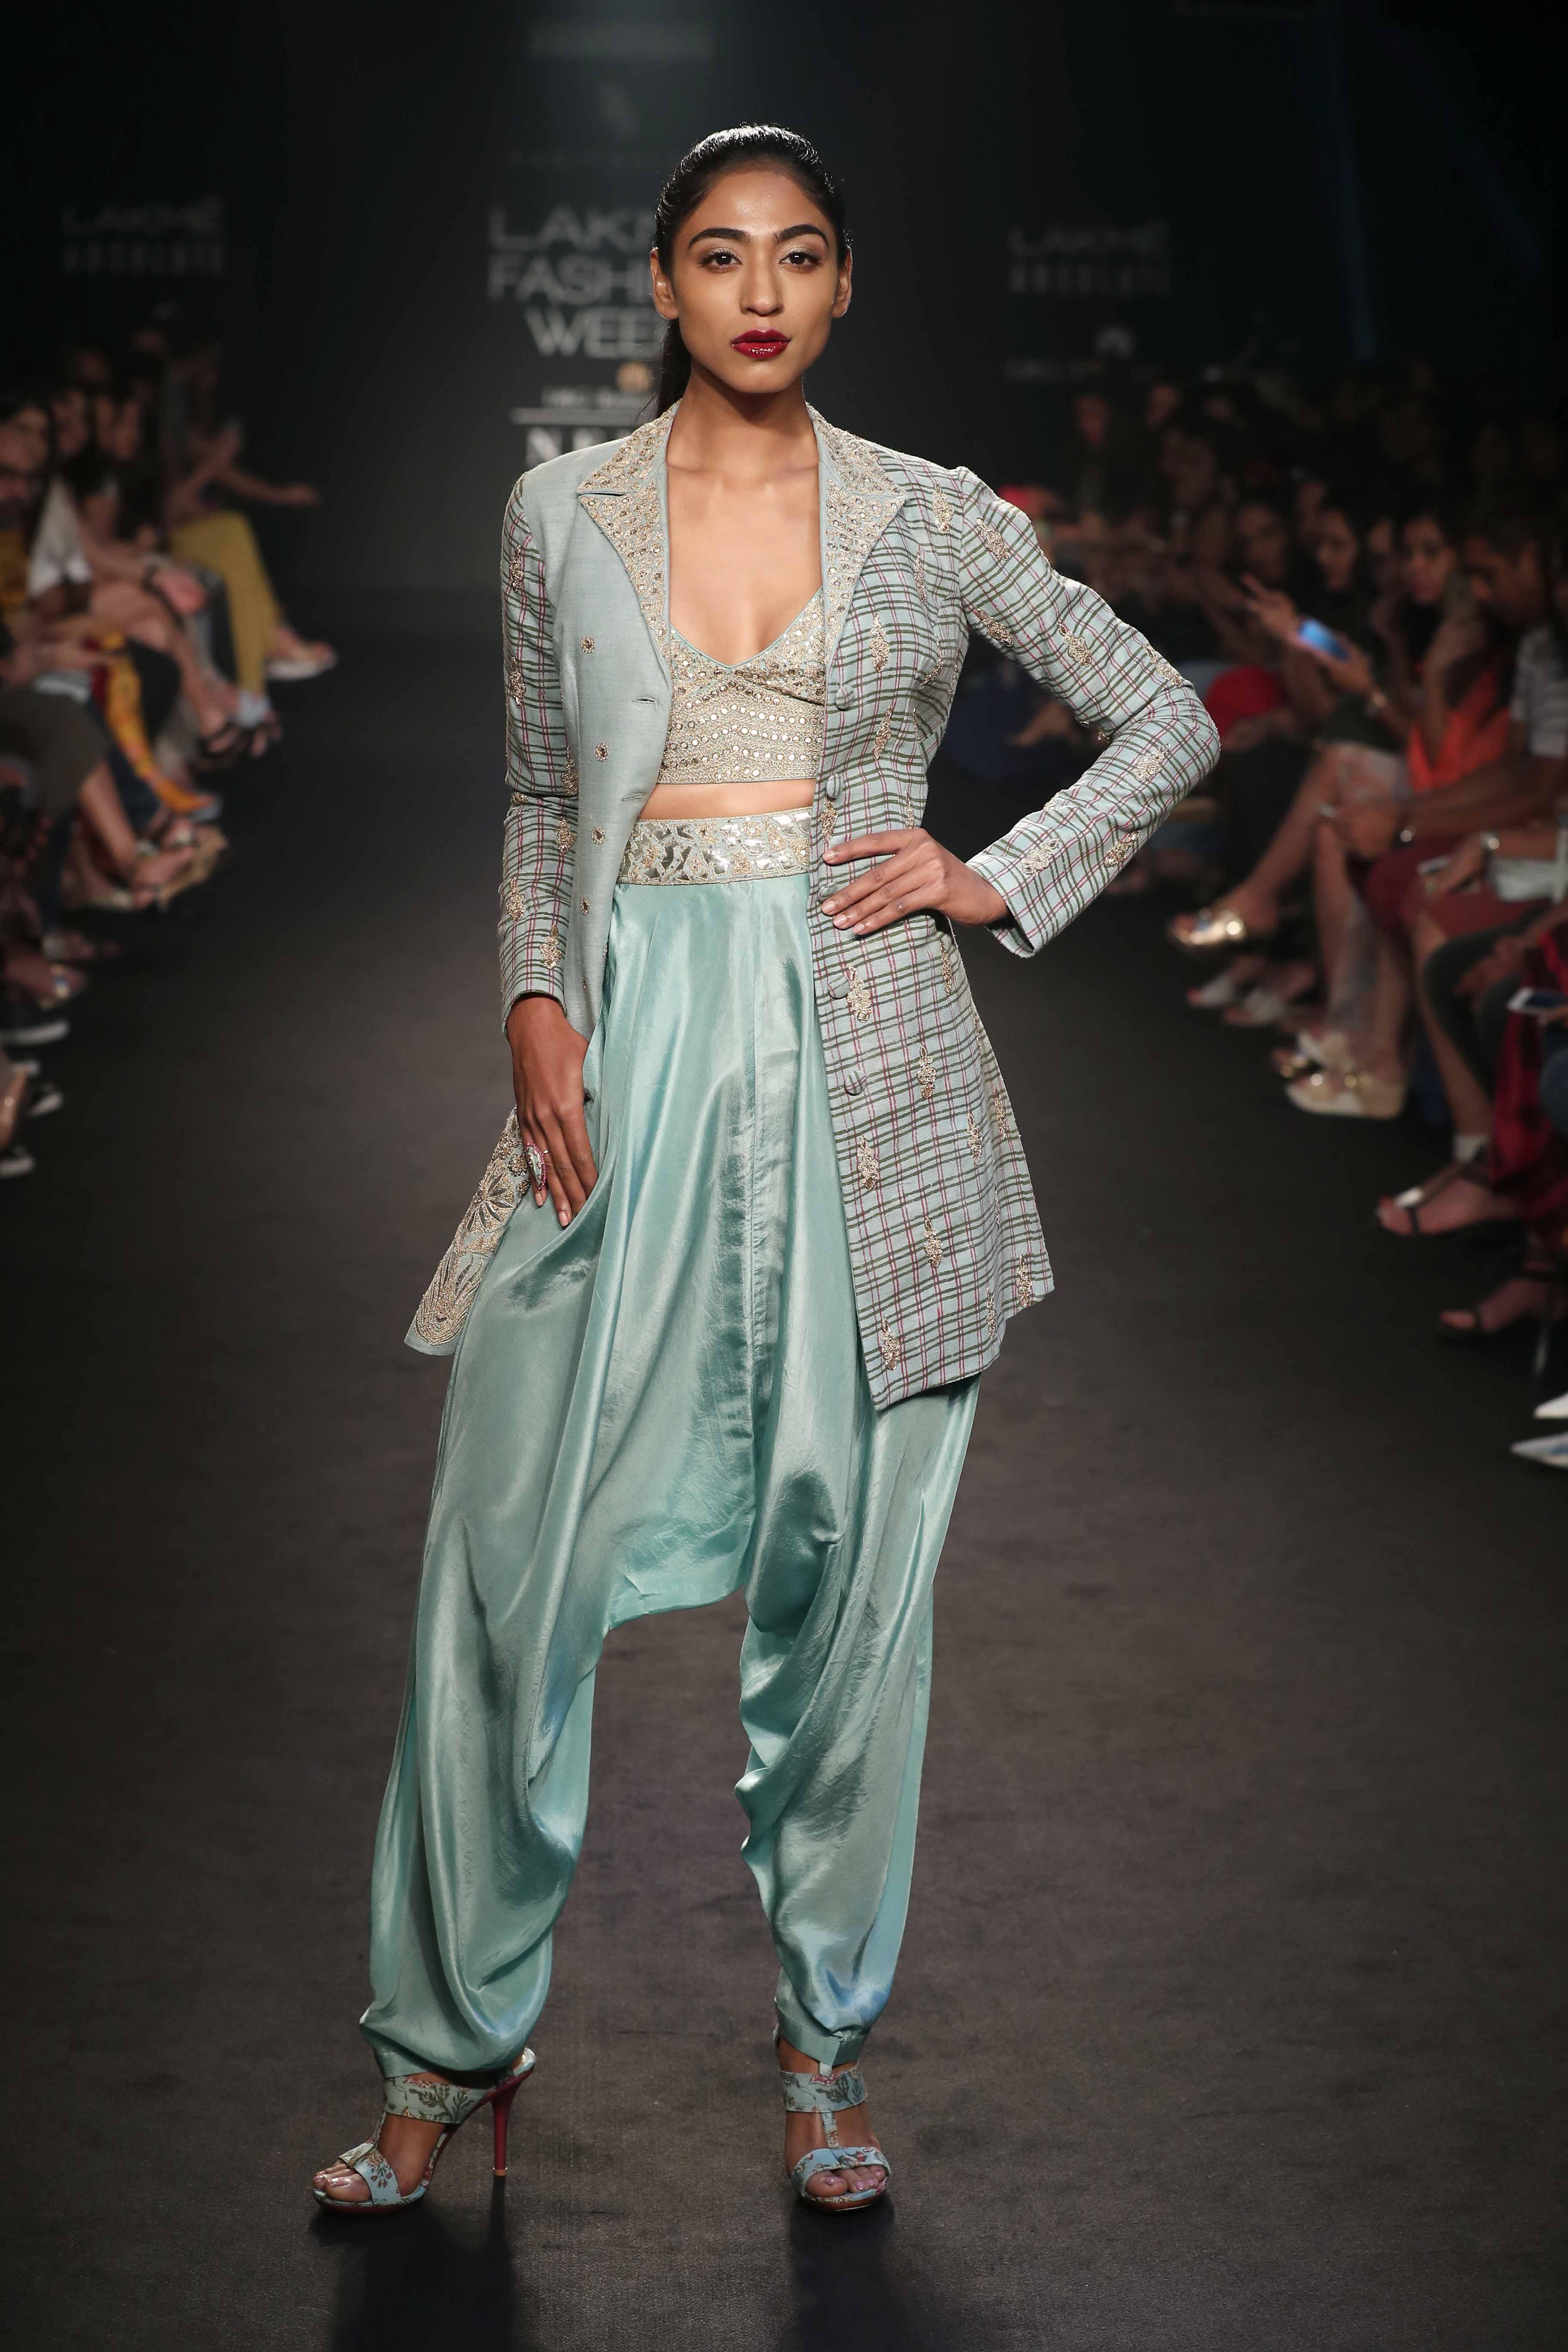 Model poses for Punit Balana - Lakme Fashion Week Winter Festive 2018